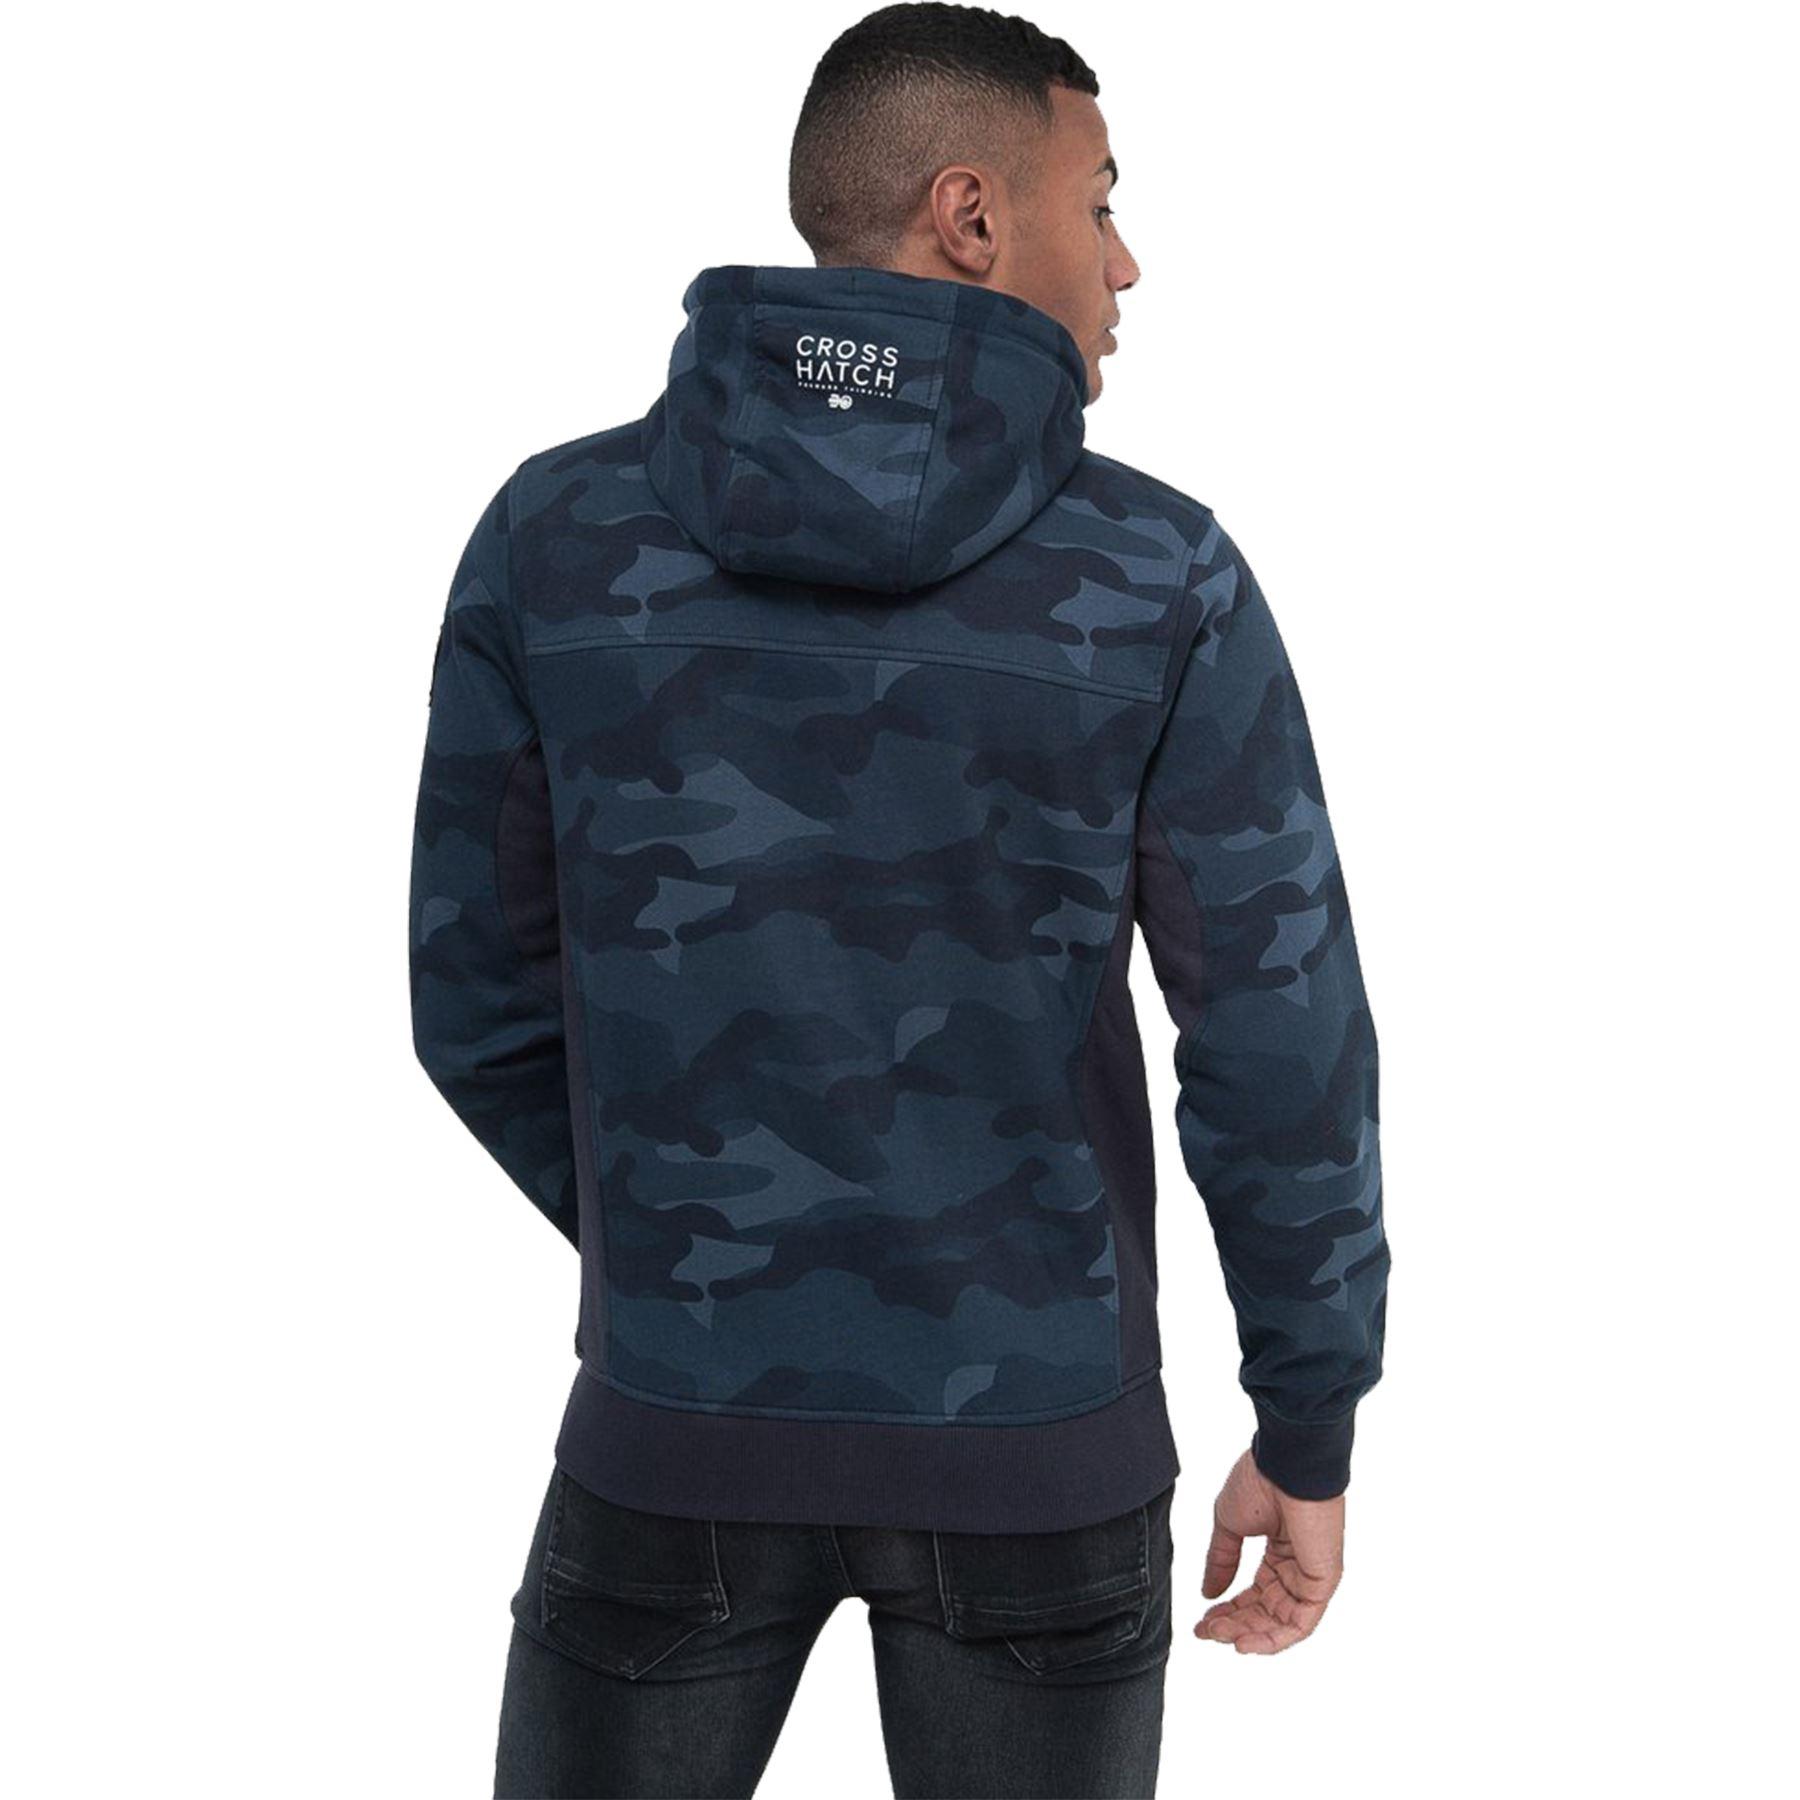 Crosshatch-Mens-Camo-Hoodie-Designer-Army-Style-Jacket-Zip-Thru-Pocket-Jacket thumbnail 3